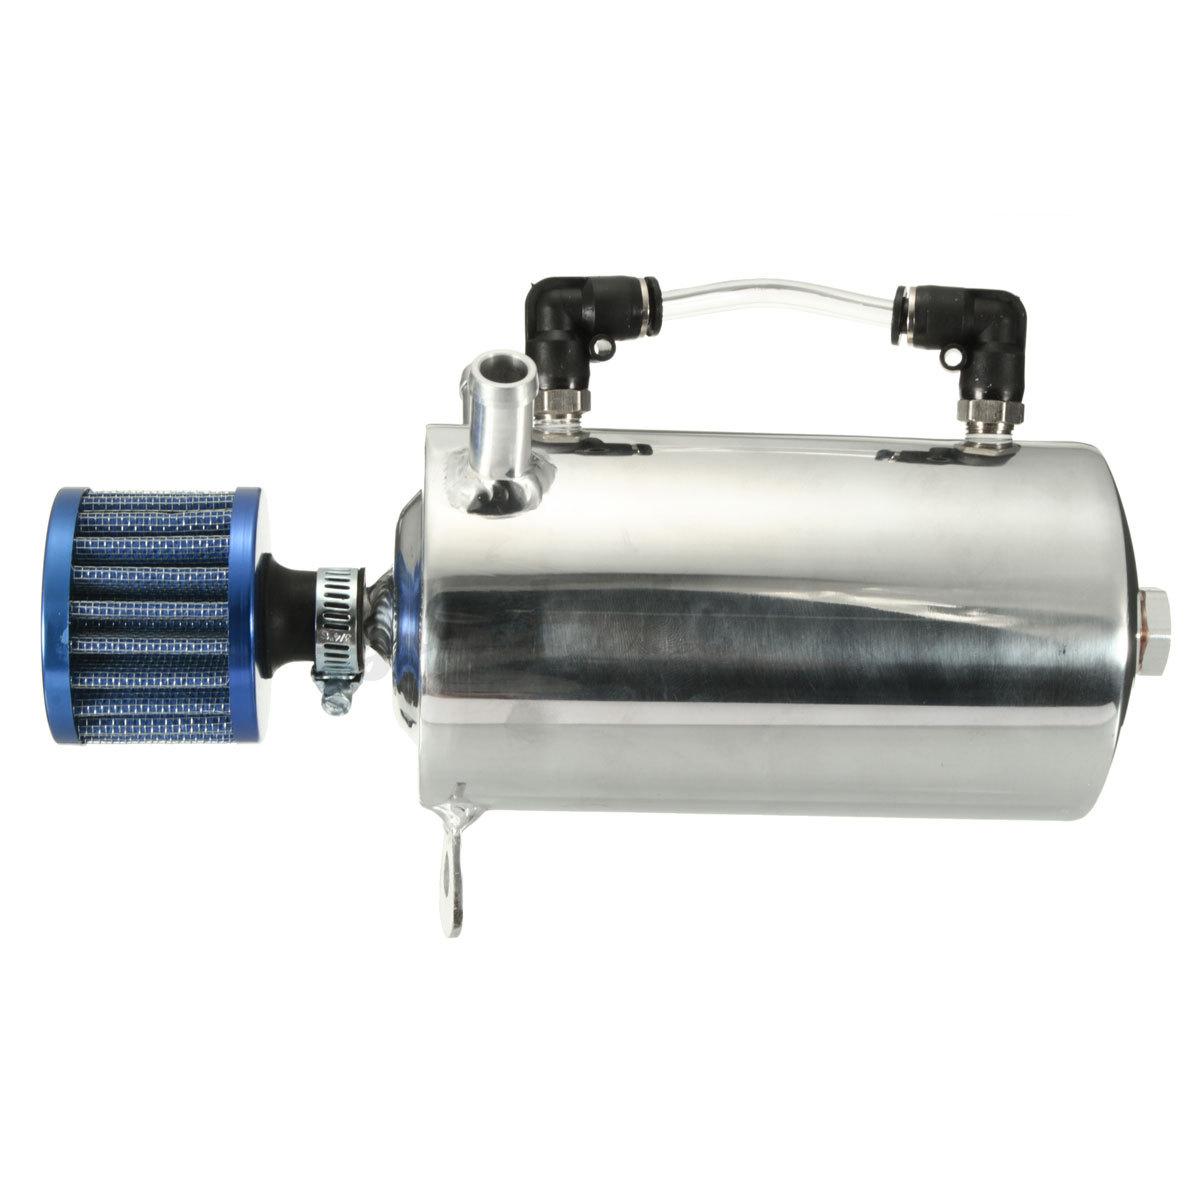 universal aluminum 0 5l engine oil catch tank can. Black Bedroom Furniture Sets. Home Design Ideas